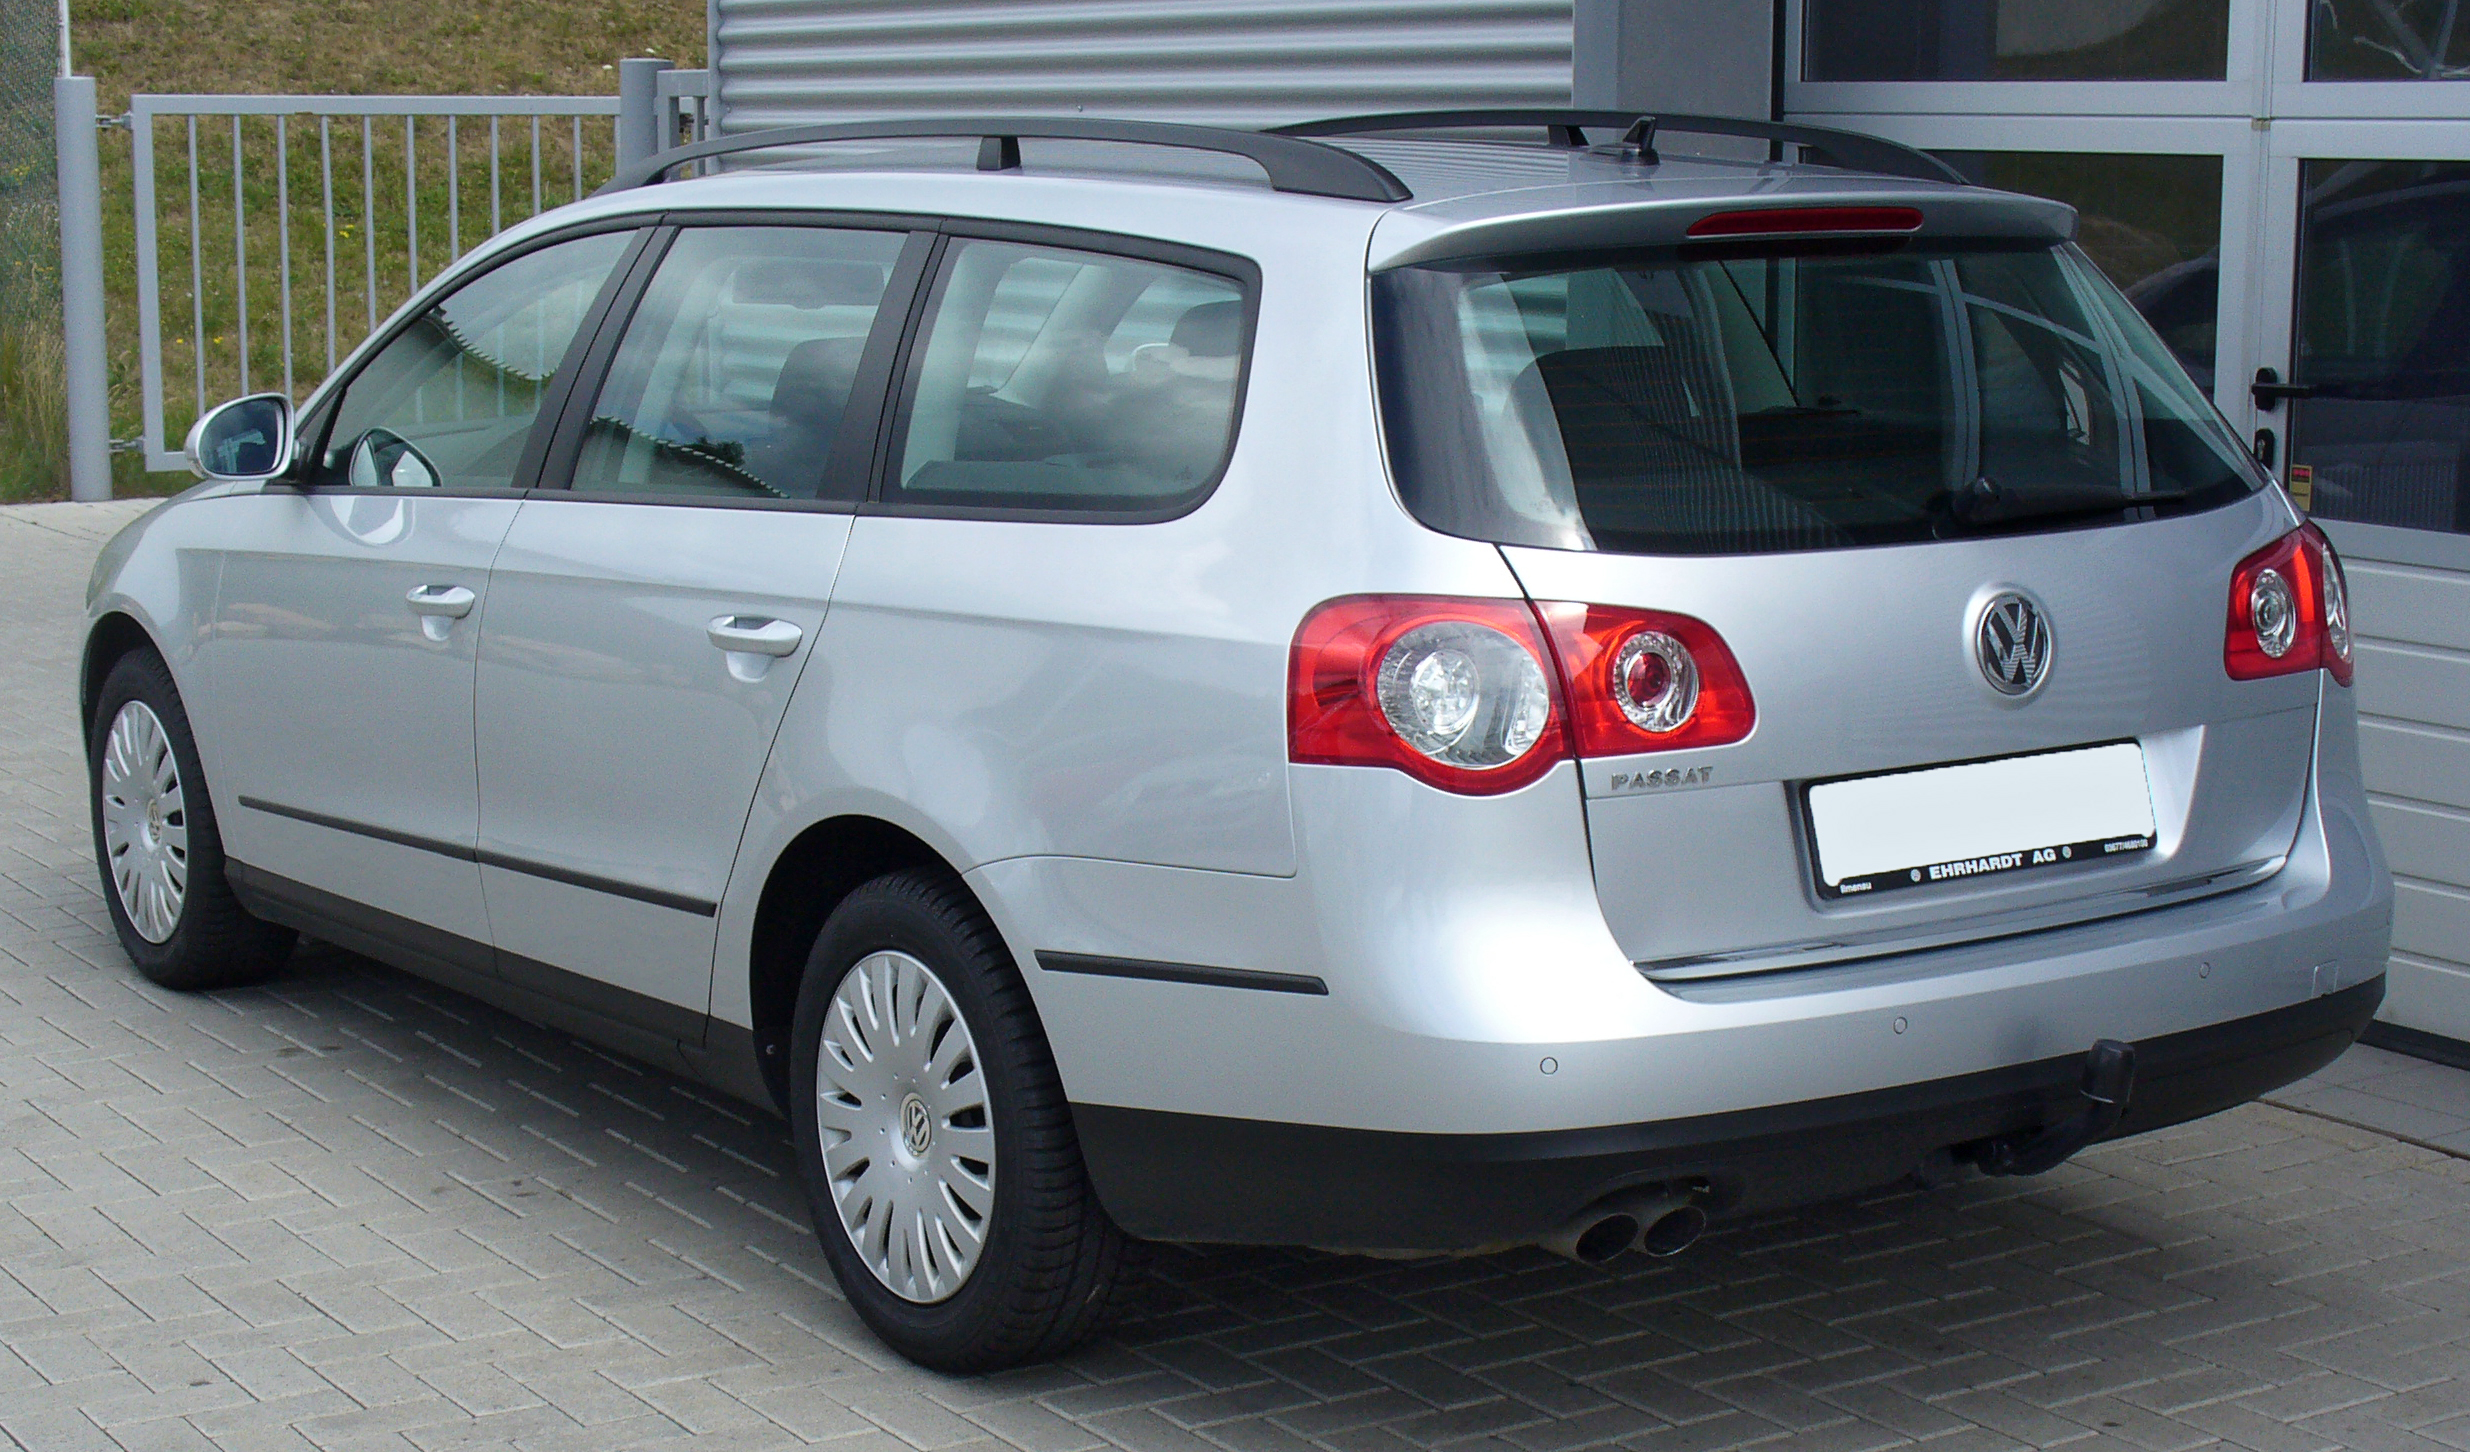 File:VW Passat Variant 2.0 TDI Trendline Reflexsilber Heck ...